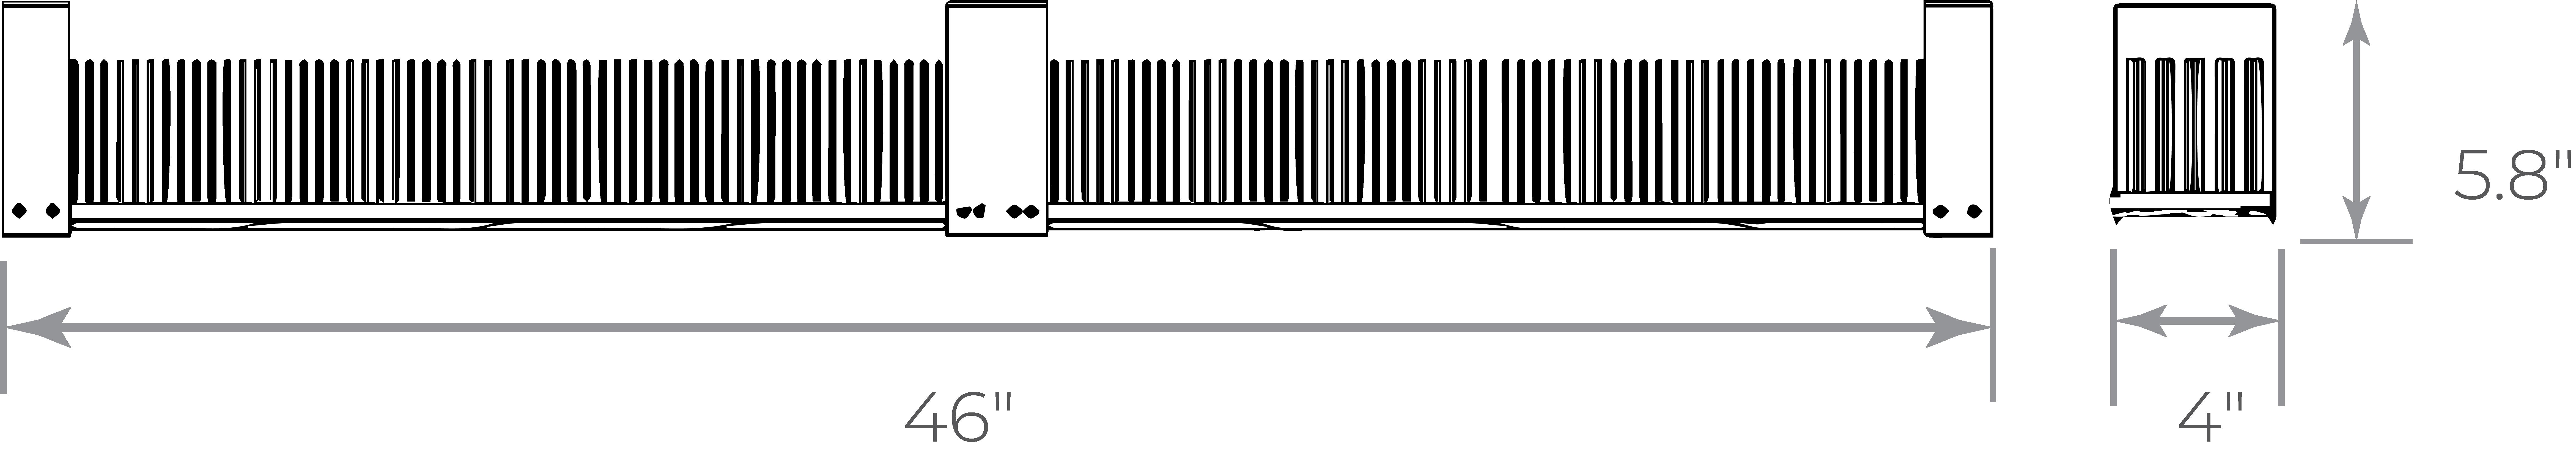 TG1000diagram